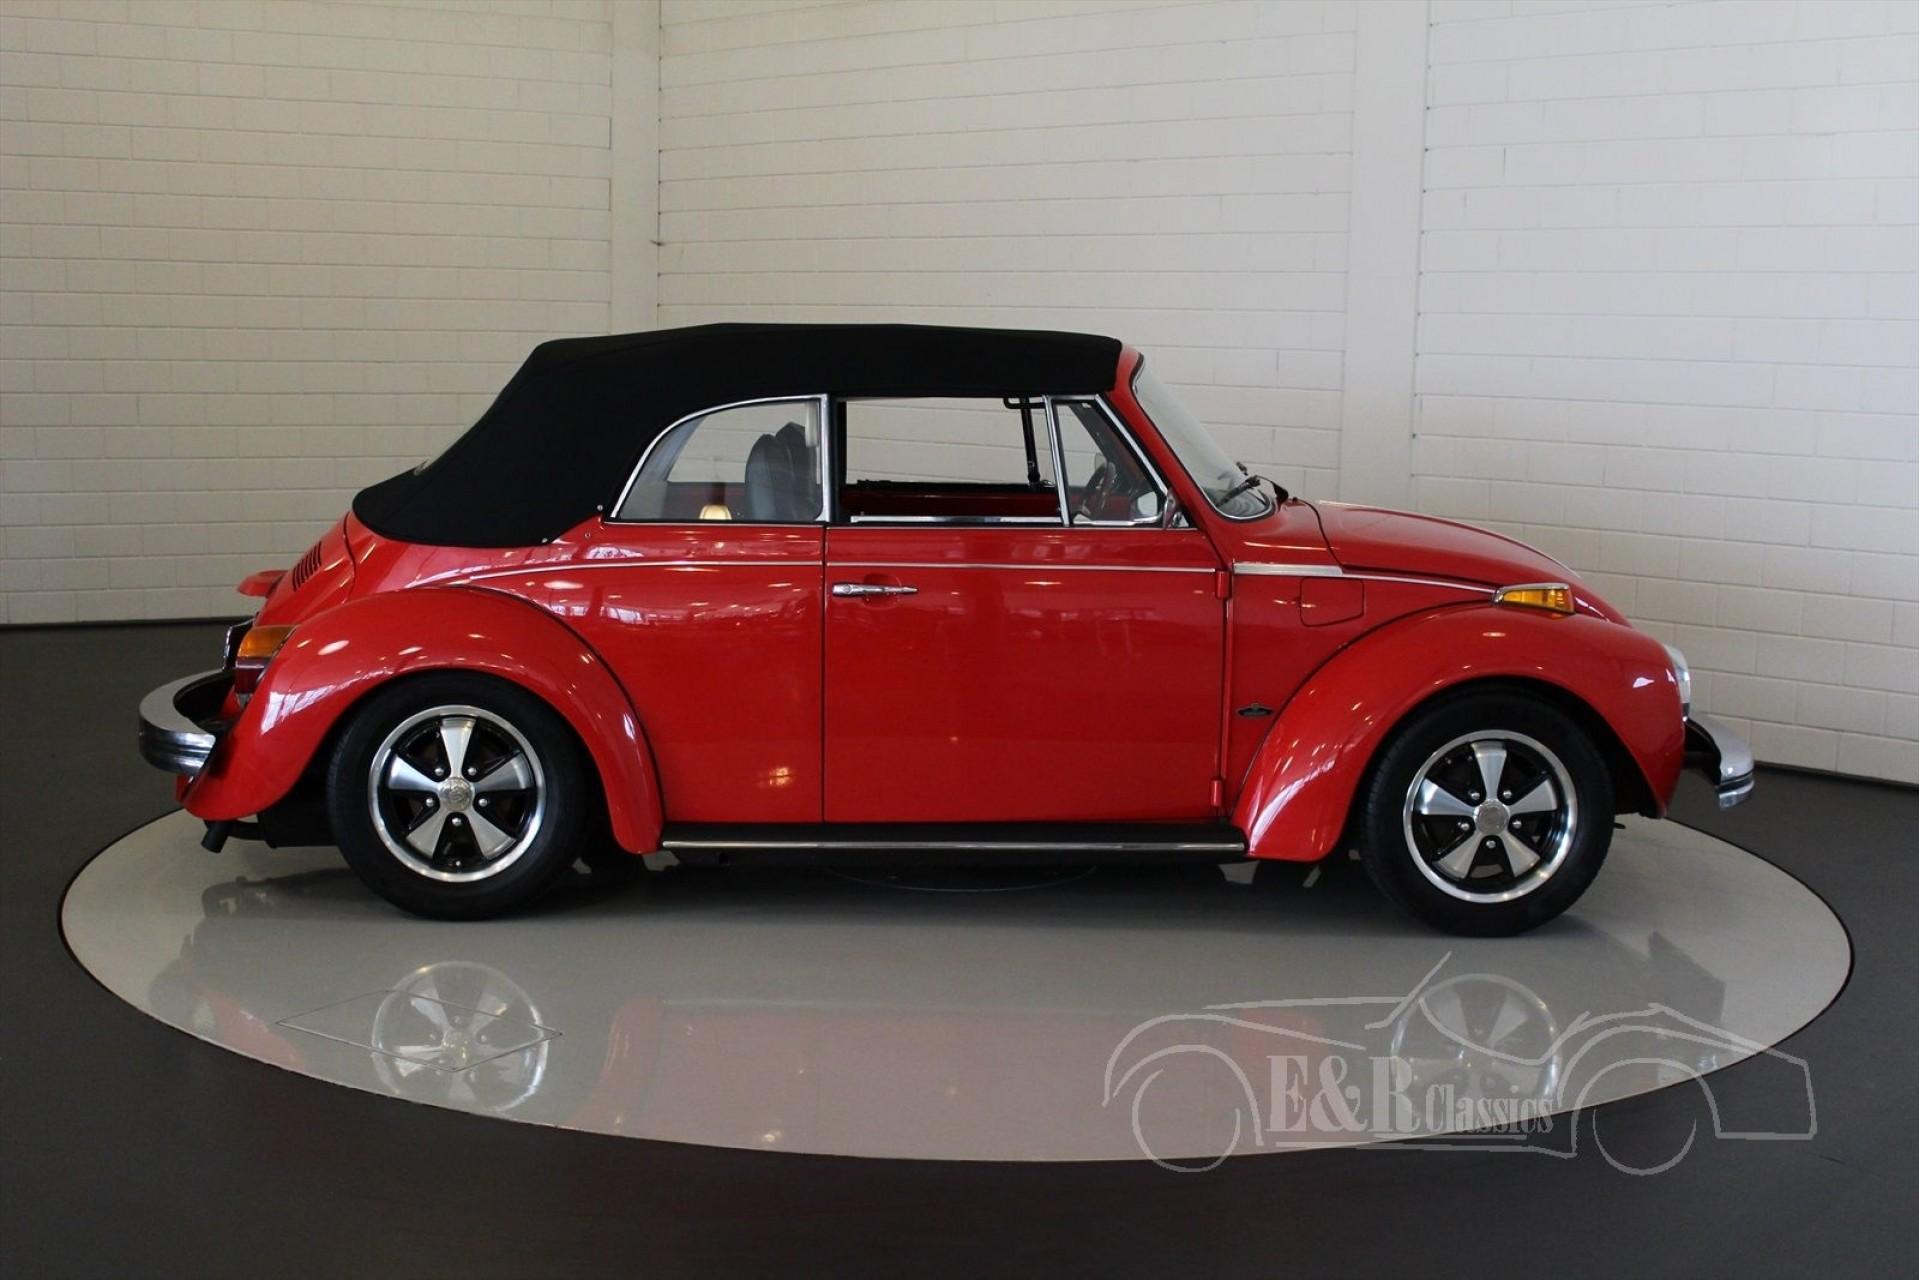 volkswagen beetle 1977 for sale at erclassics. Black Bedroom Furniture Sets. Home Design Ideas